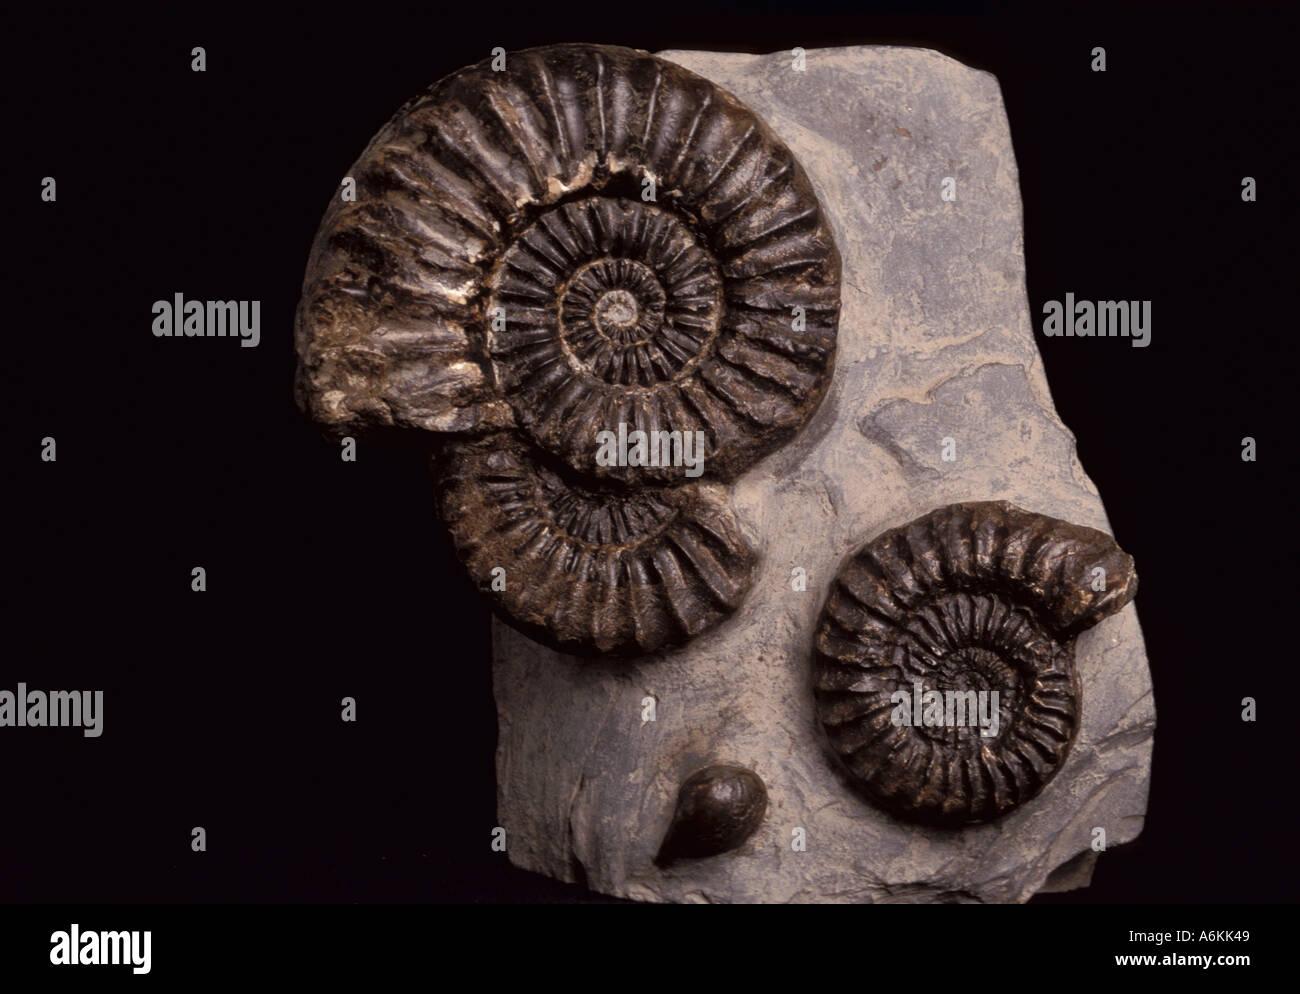 Ammonites Fossil on stone Jurassic period time 200 Million years ago spiral mollusc like animal - Stock Image